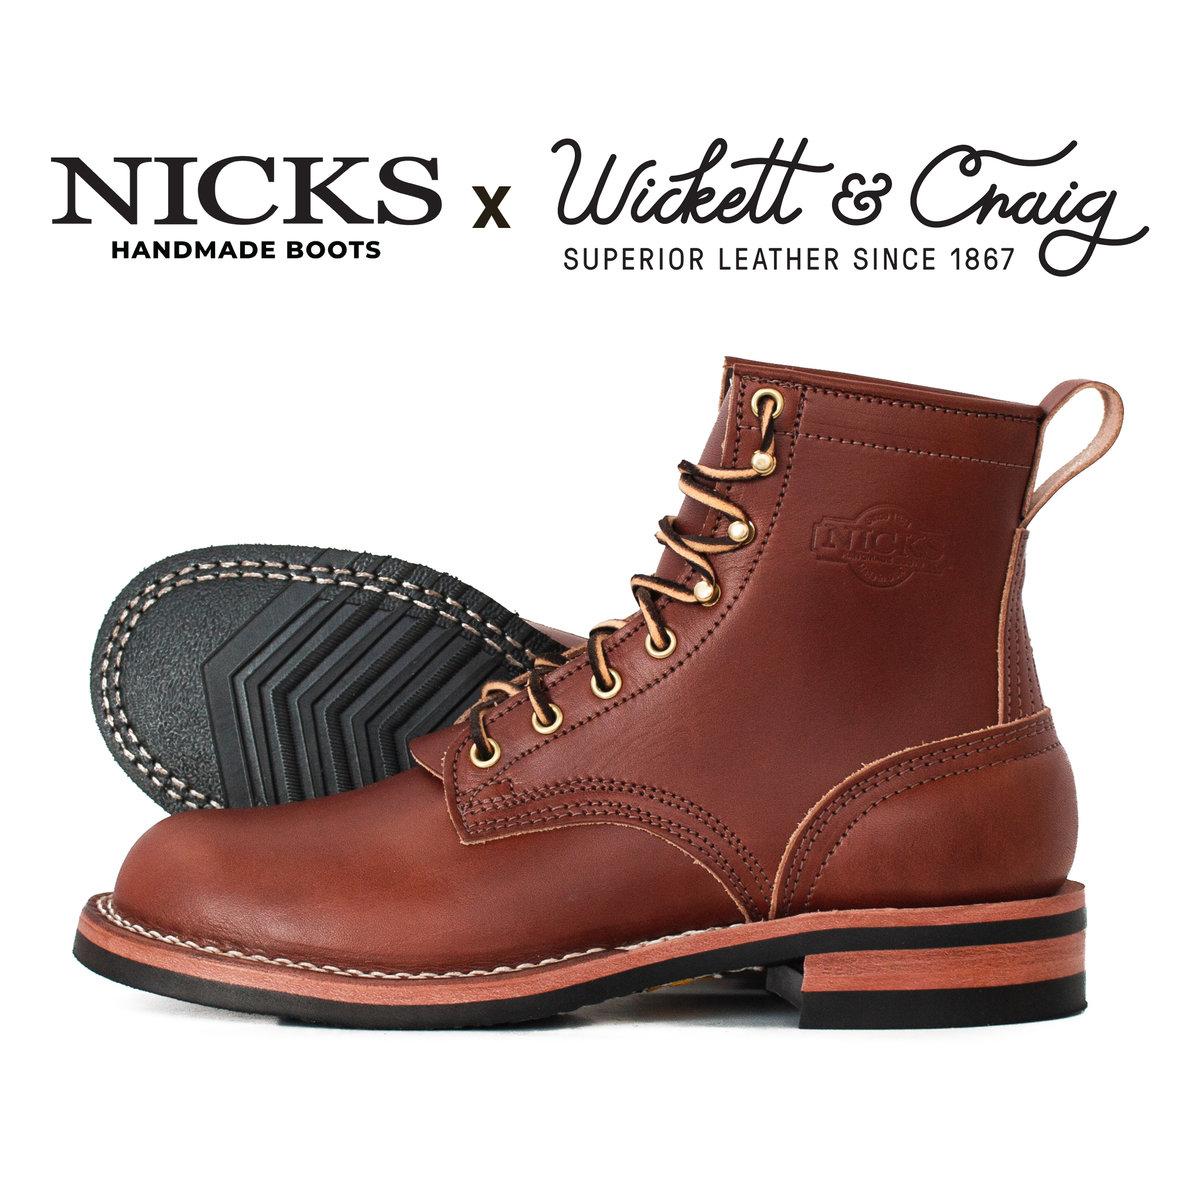 Wickett-and-Craig-Nicks-Boots-Boot-2-Work.jpg